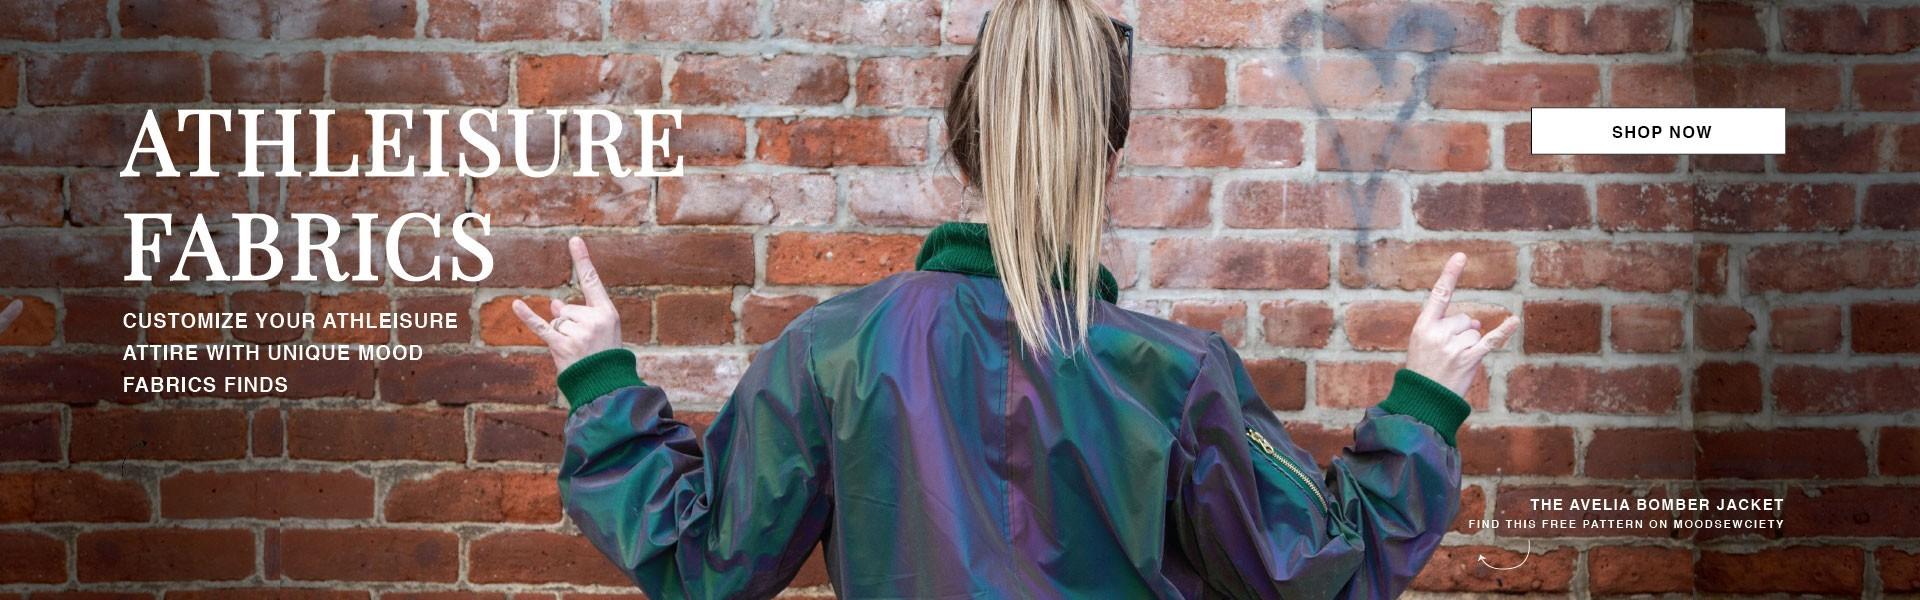 Shop Athleisure Fashion Fabrics